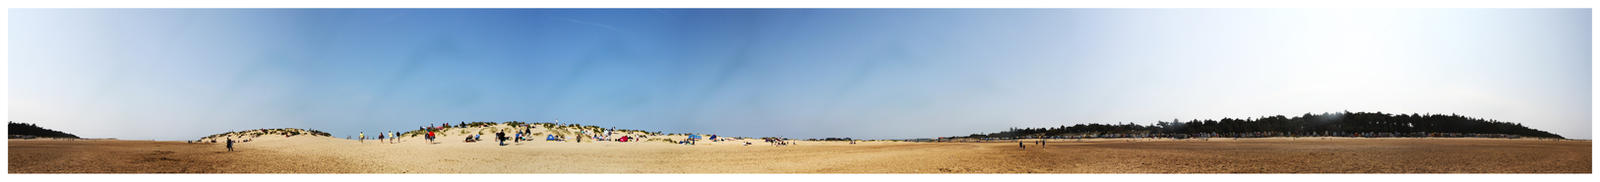 360 Degree Beach Panorama by TakeMeToAnotherPlace